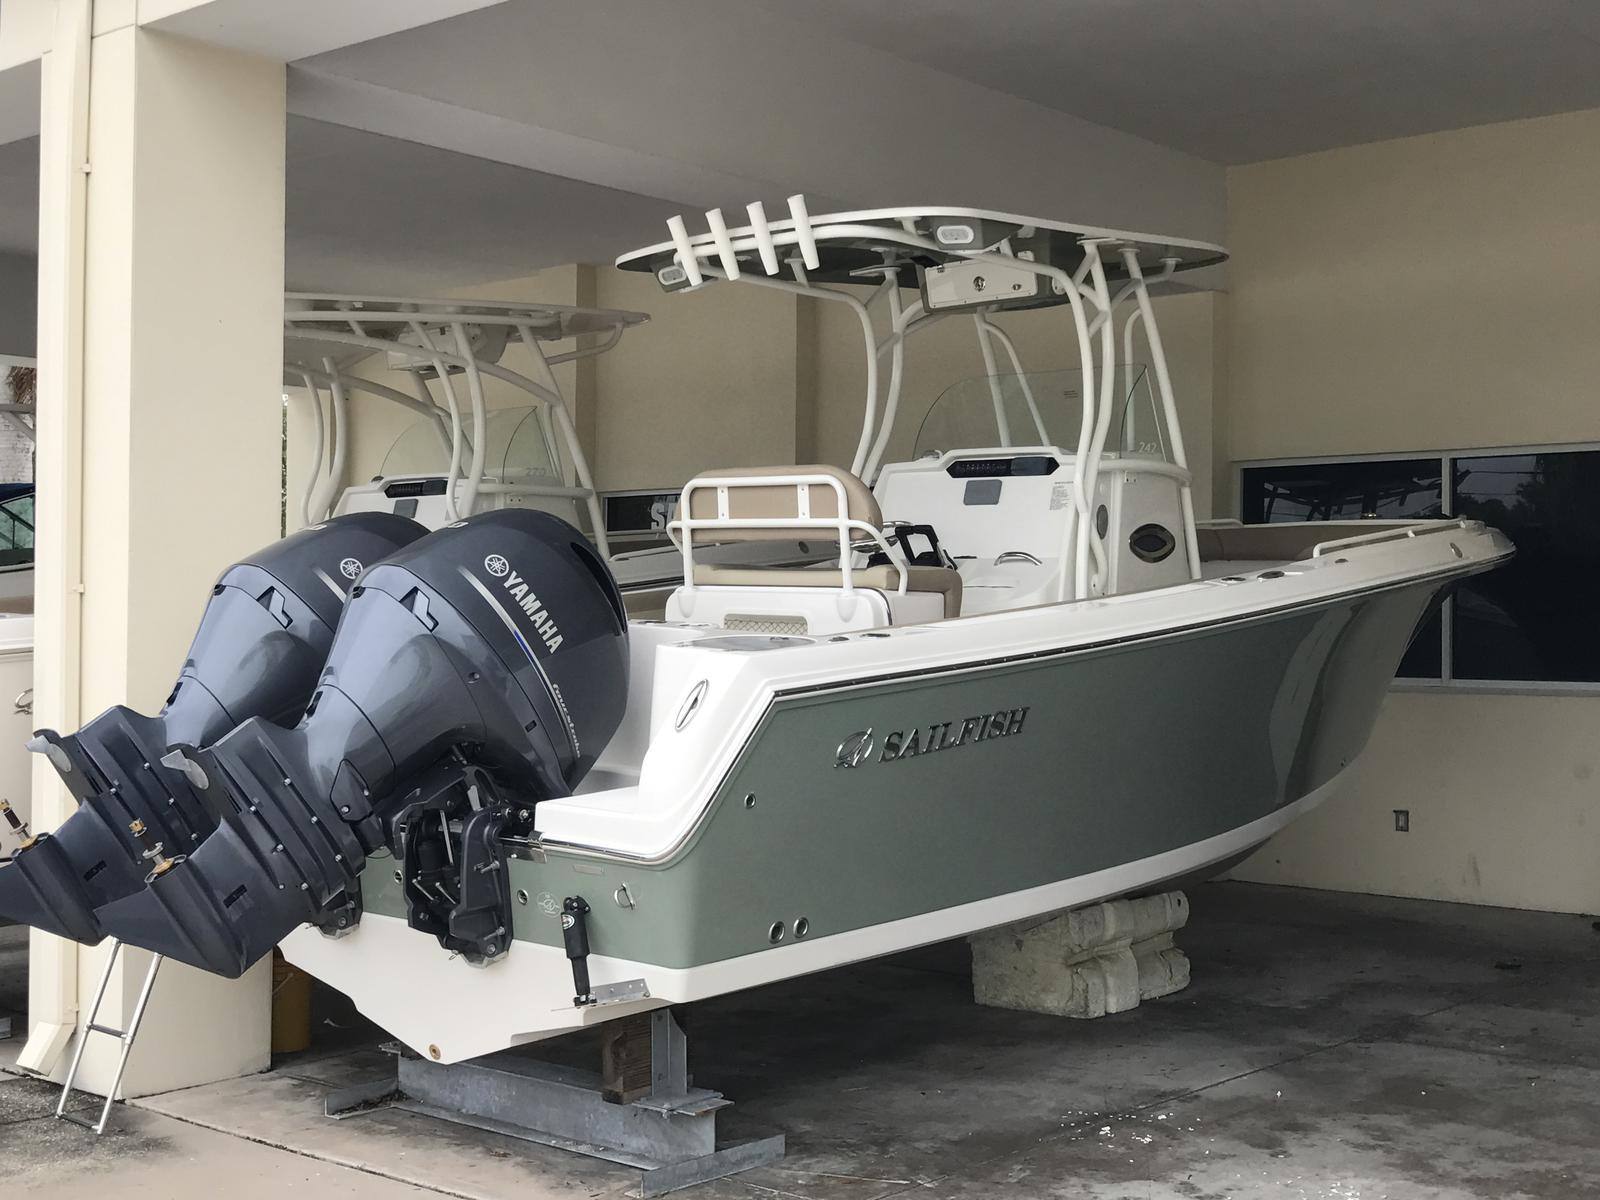 NEW 2018 Sailfish 242 CC - Sara Bay Marina